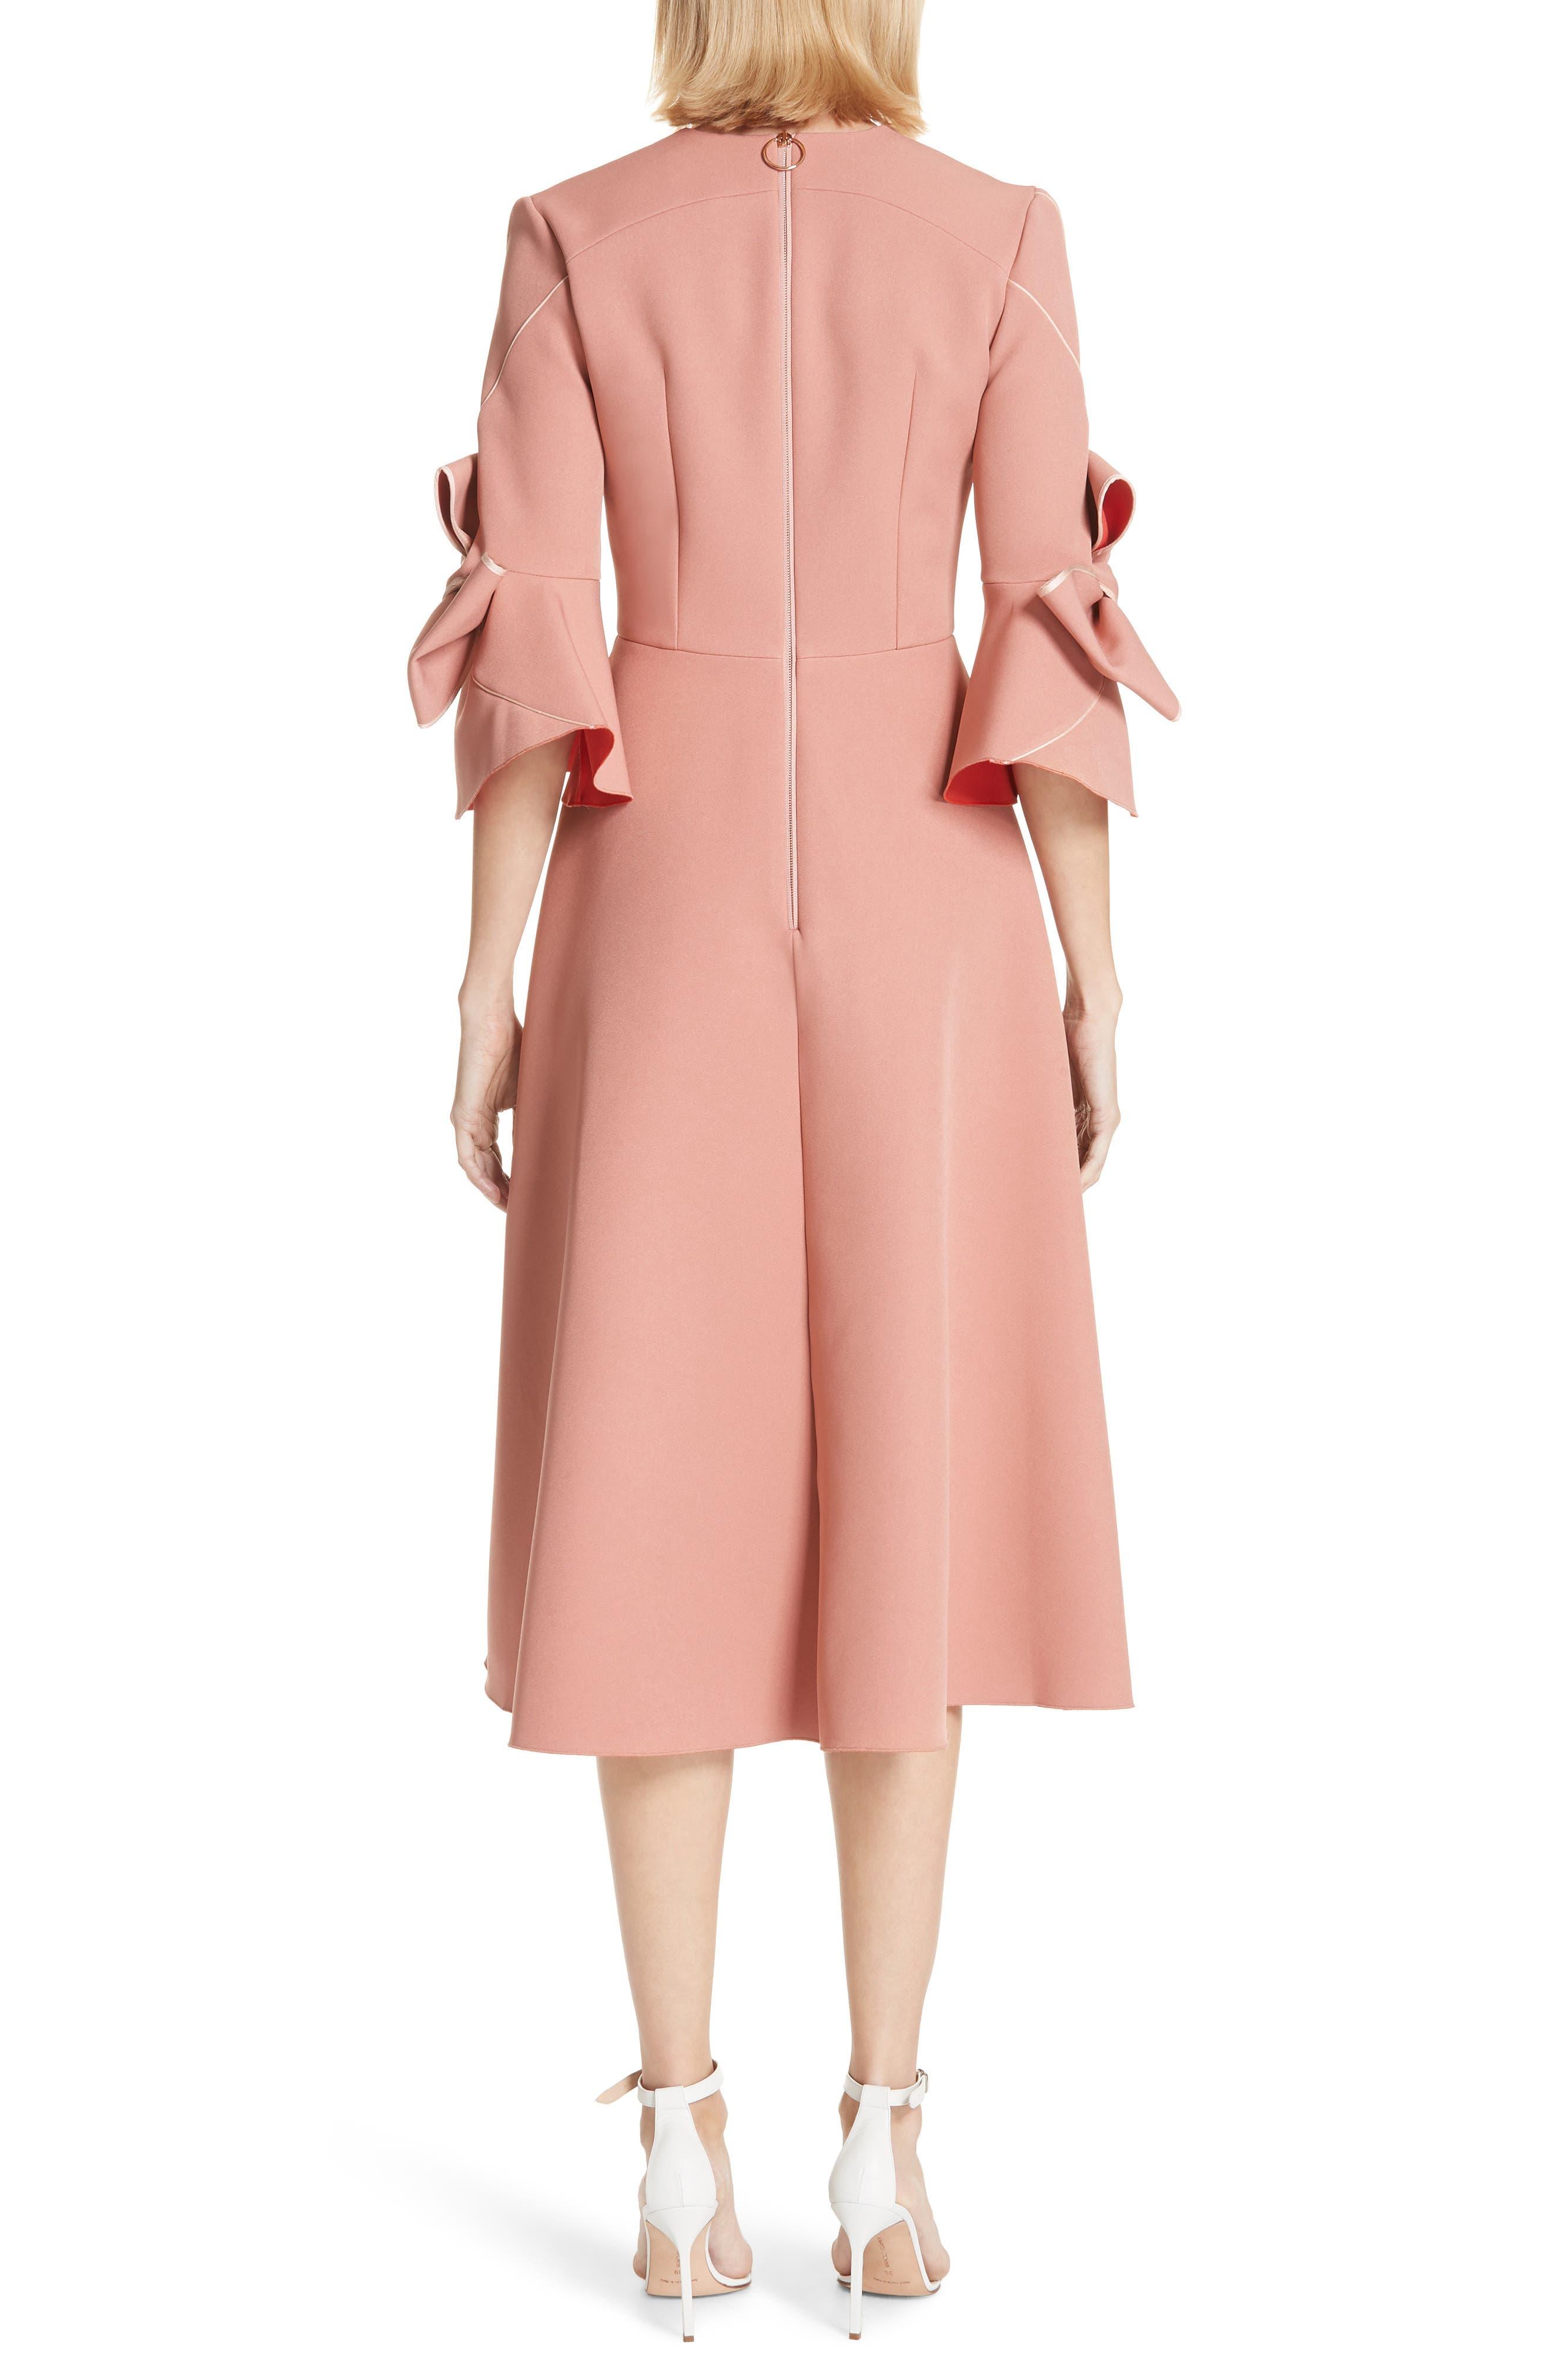 Sibella Bow Trim Dress,                             Alternate thumbnail 2, color,                             950